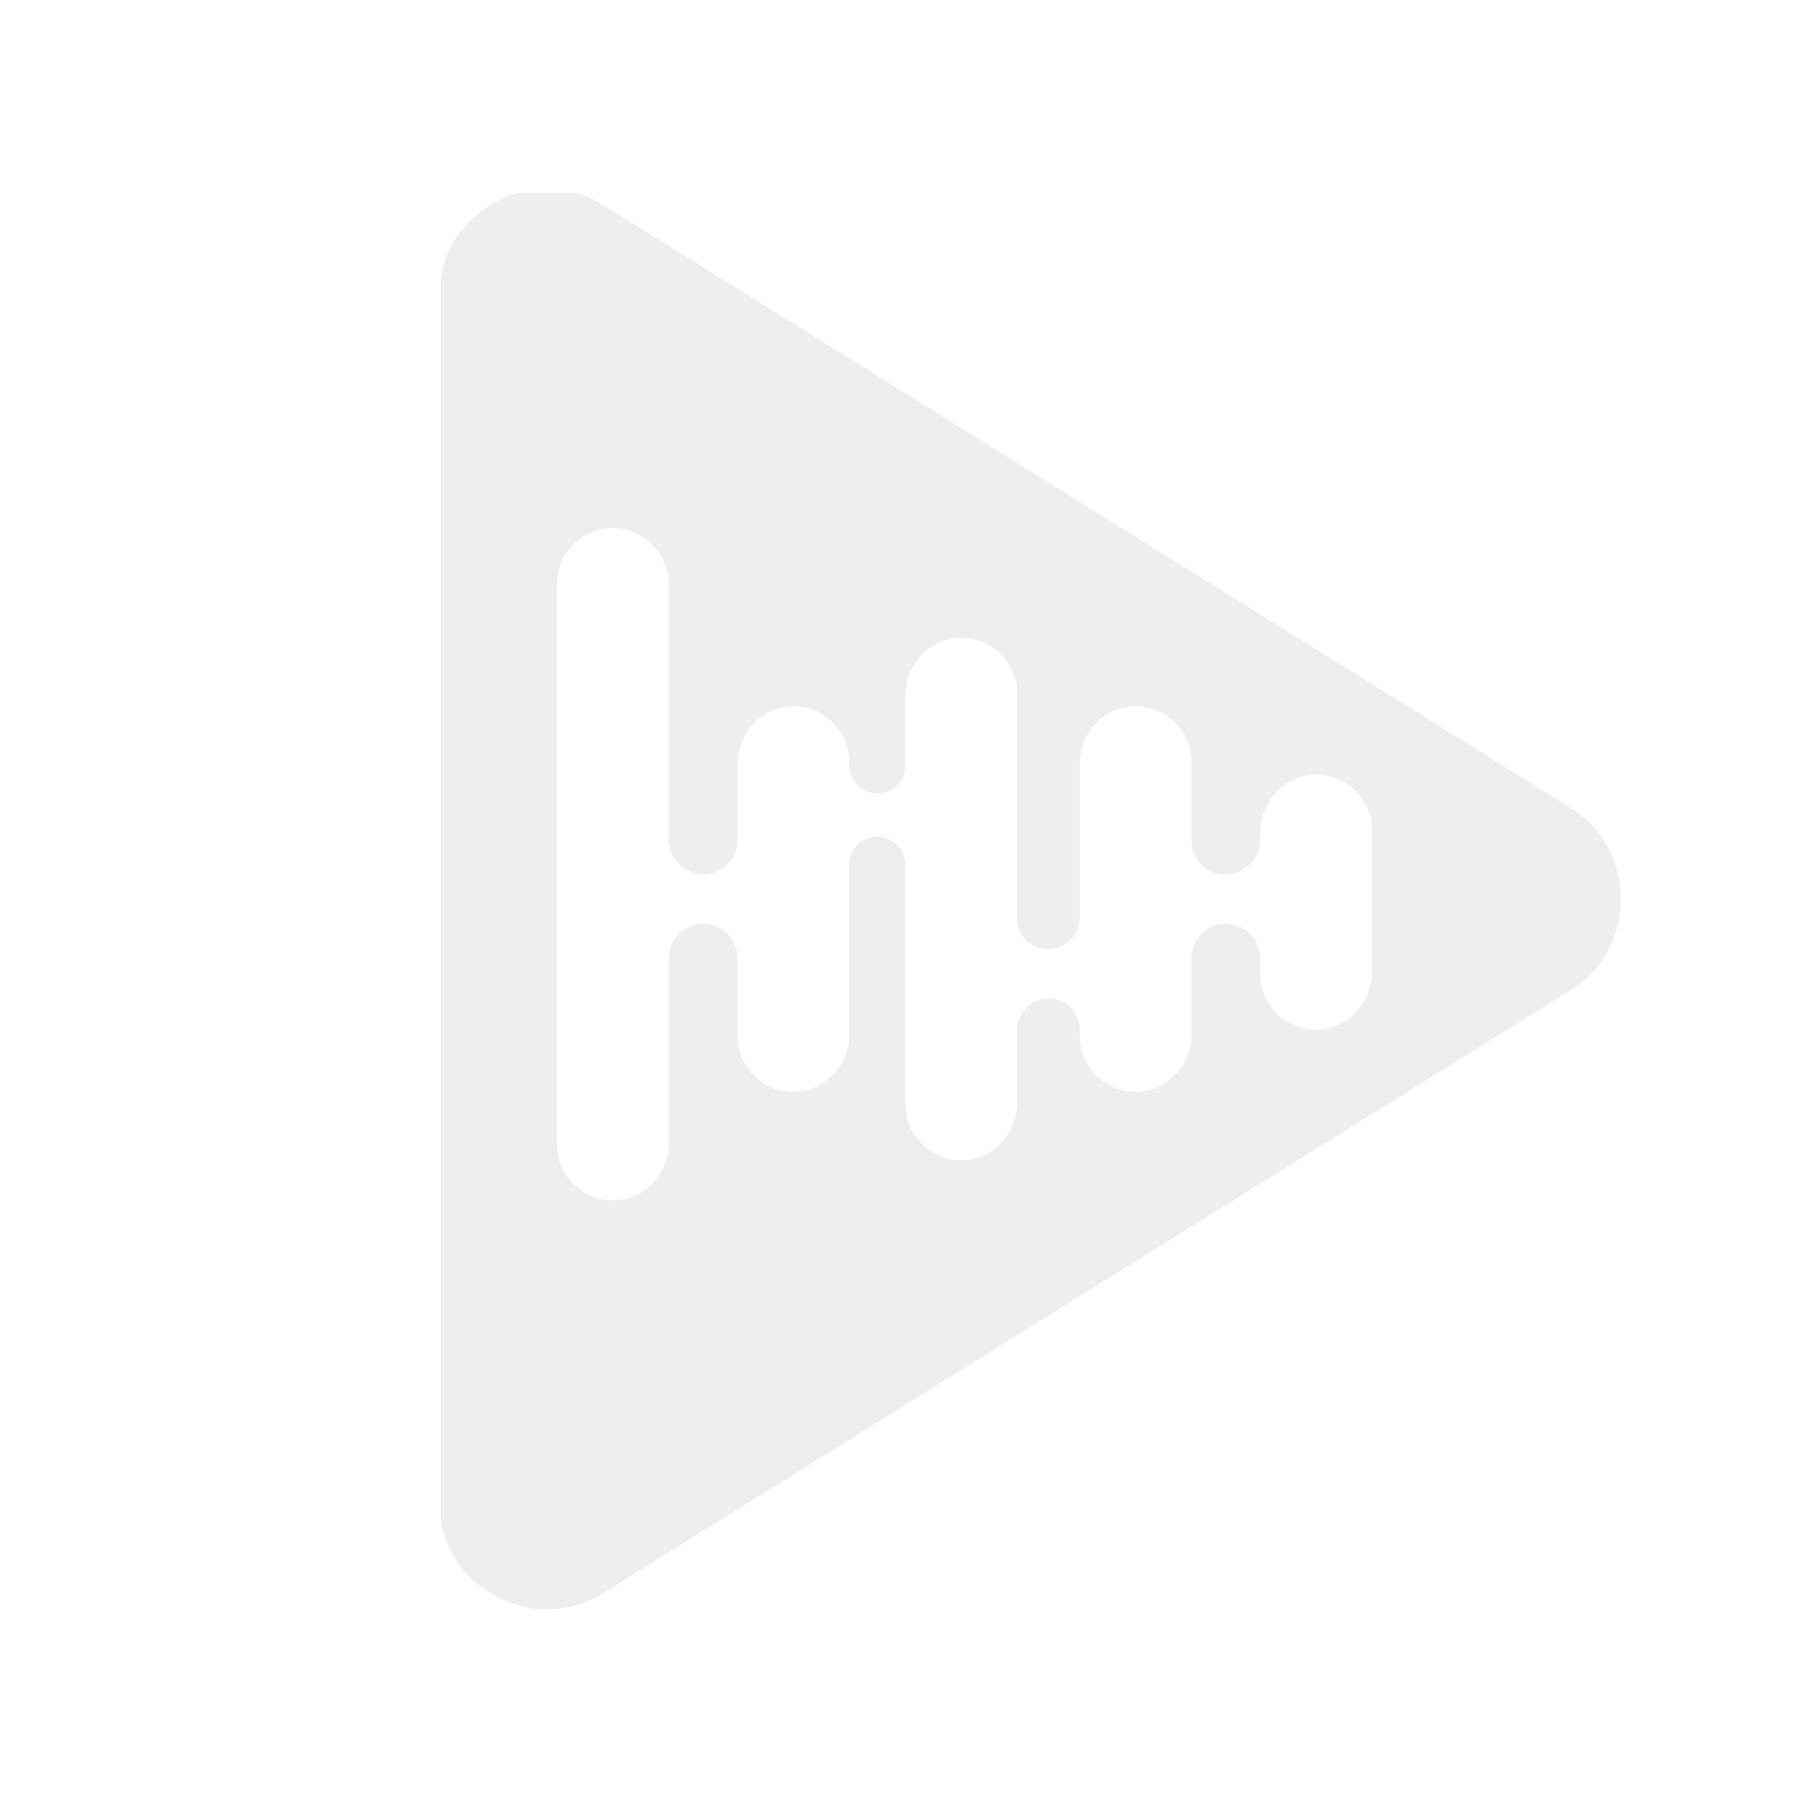 Hertz Dieci DCX 570.3 - 2-veis 5x7